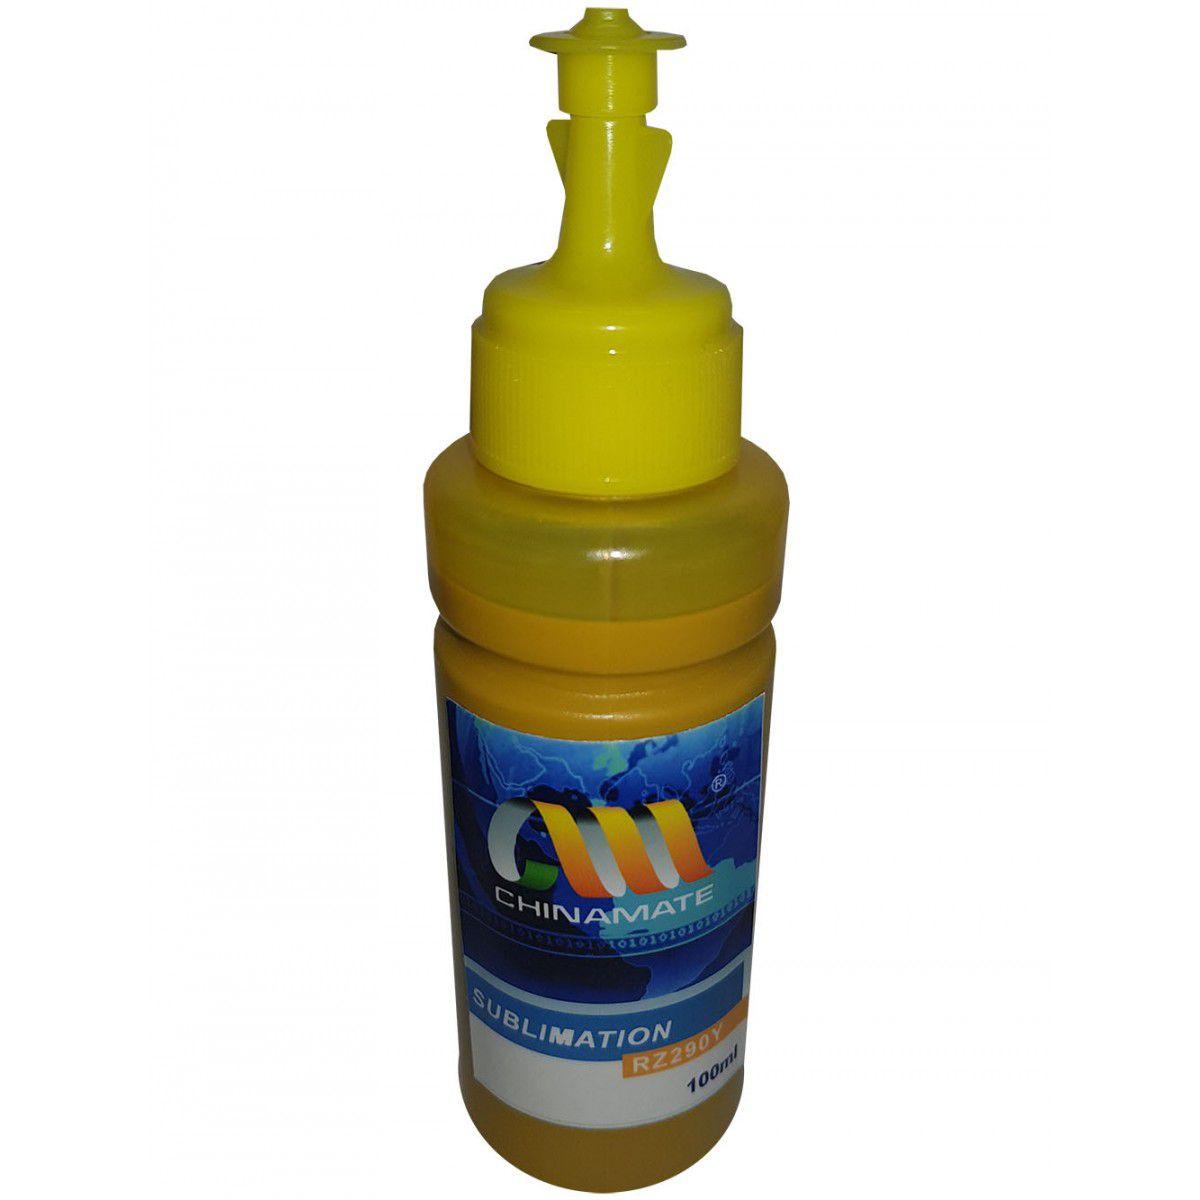 Tinta Sublimática Compatível Epson - Amarela - 100ml  - INK House